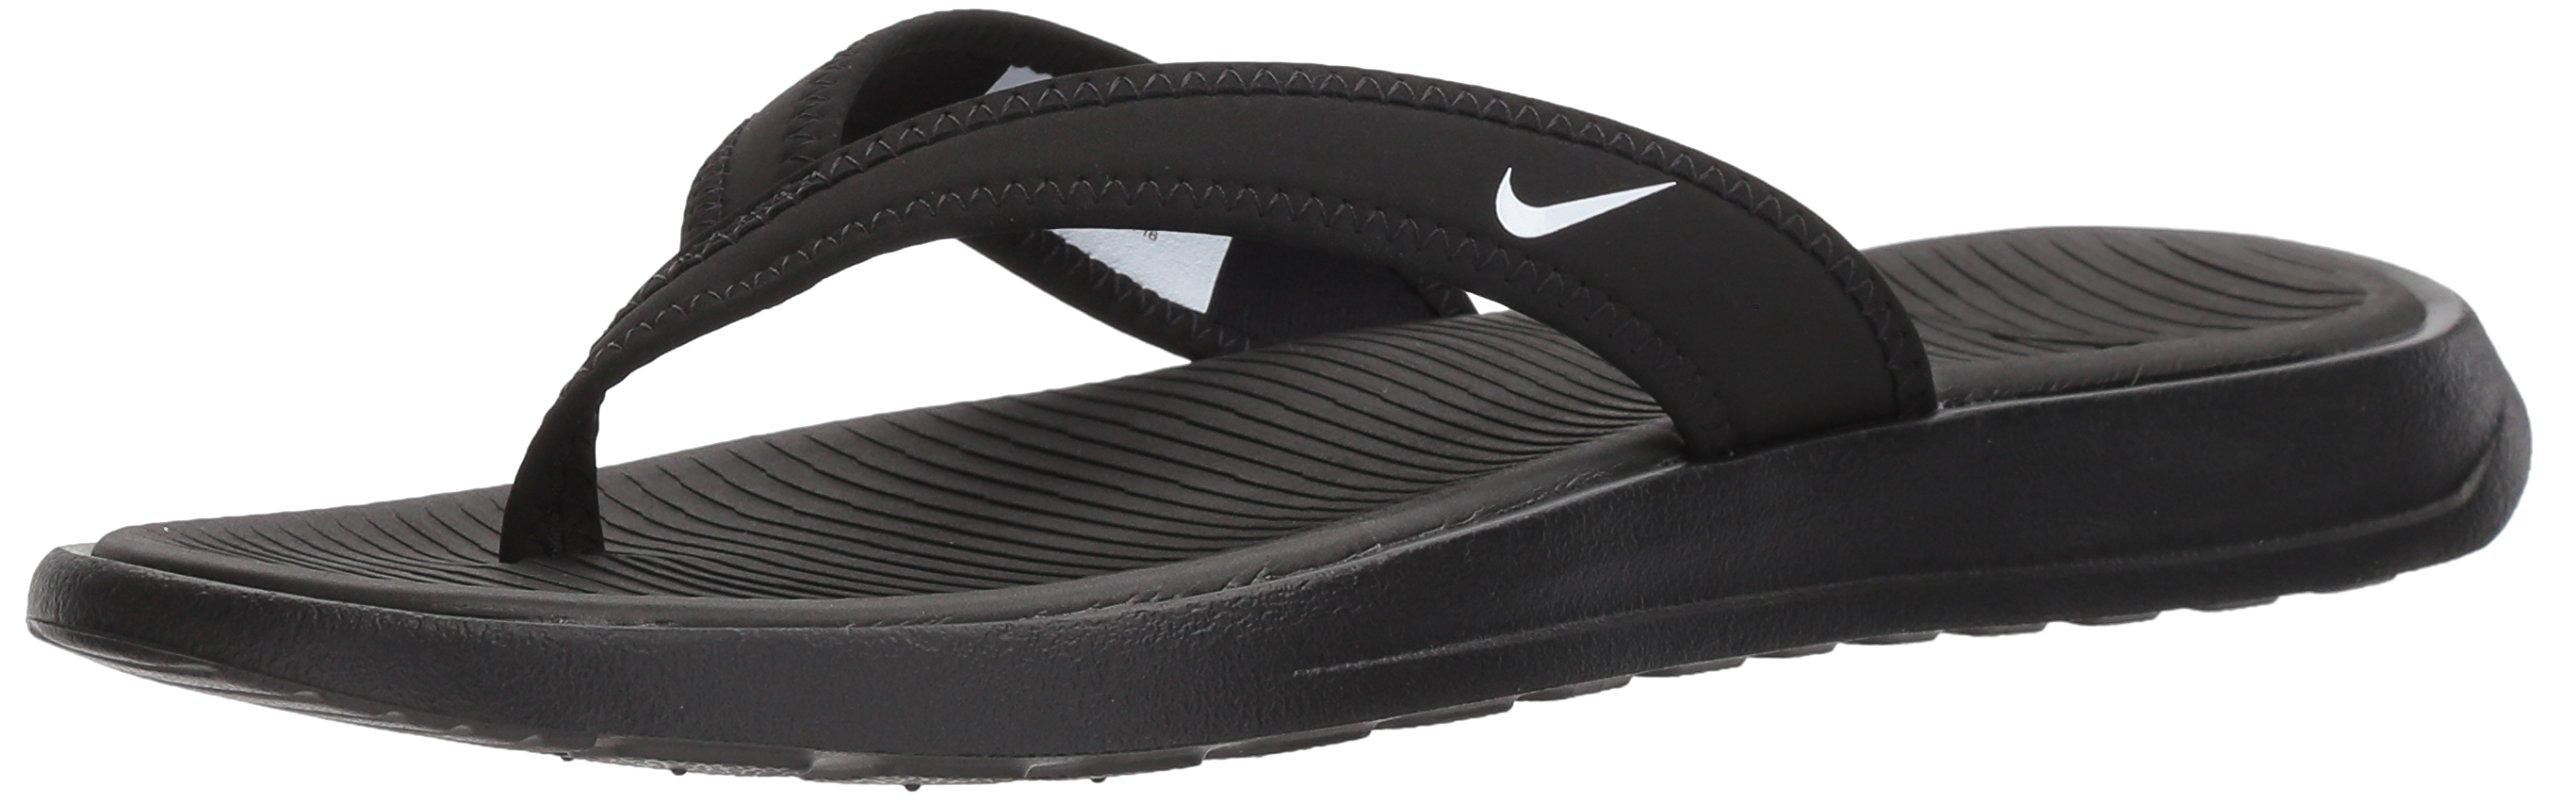 NIKE Women's Ultra Celso Thong Flip-Flop, Black/White, 10.0 Regular US